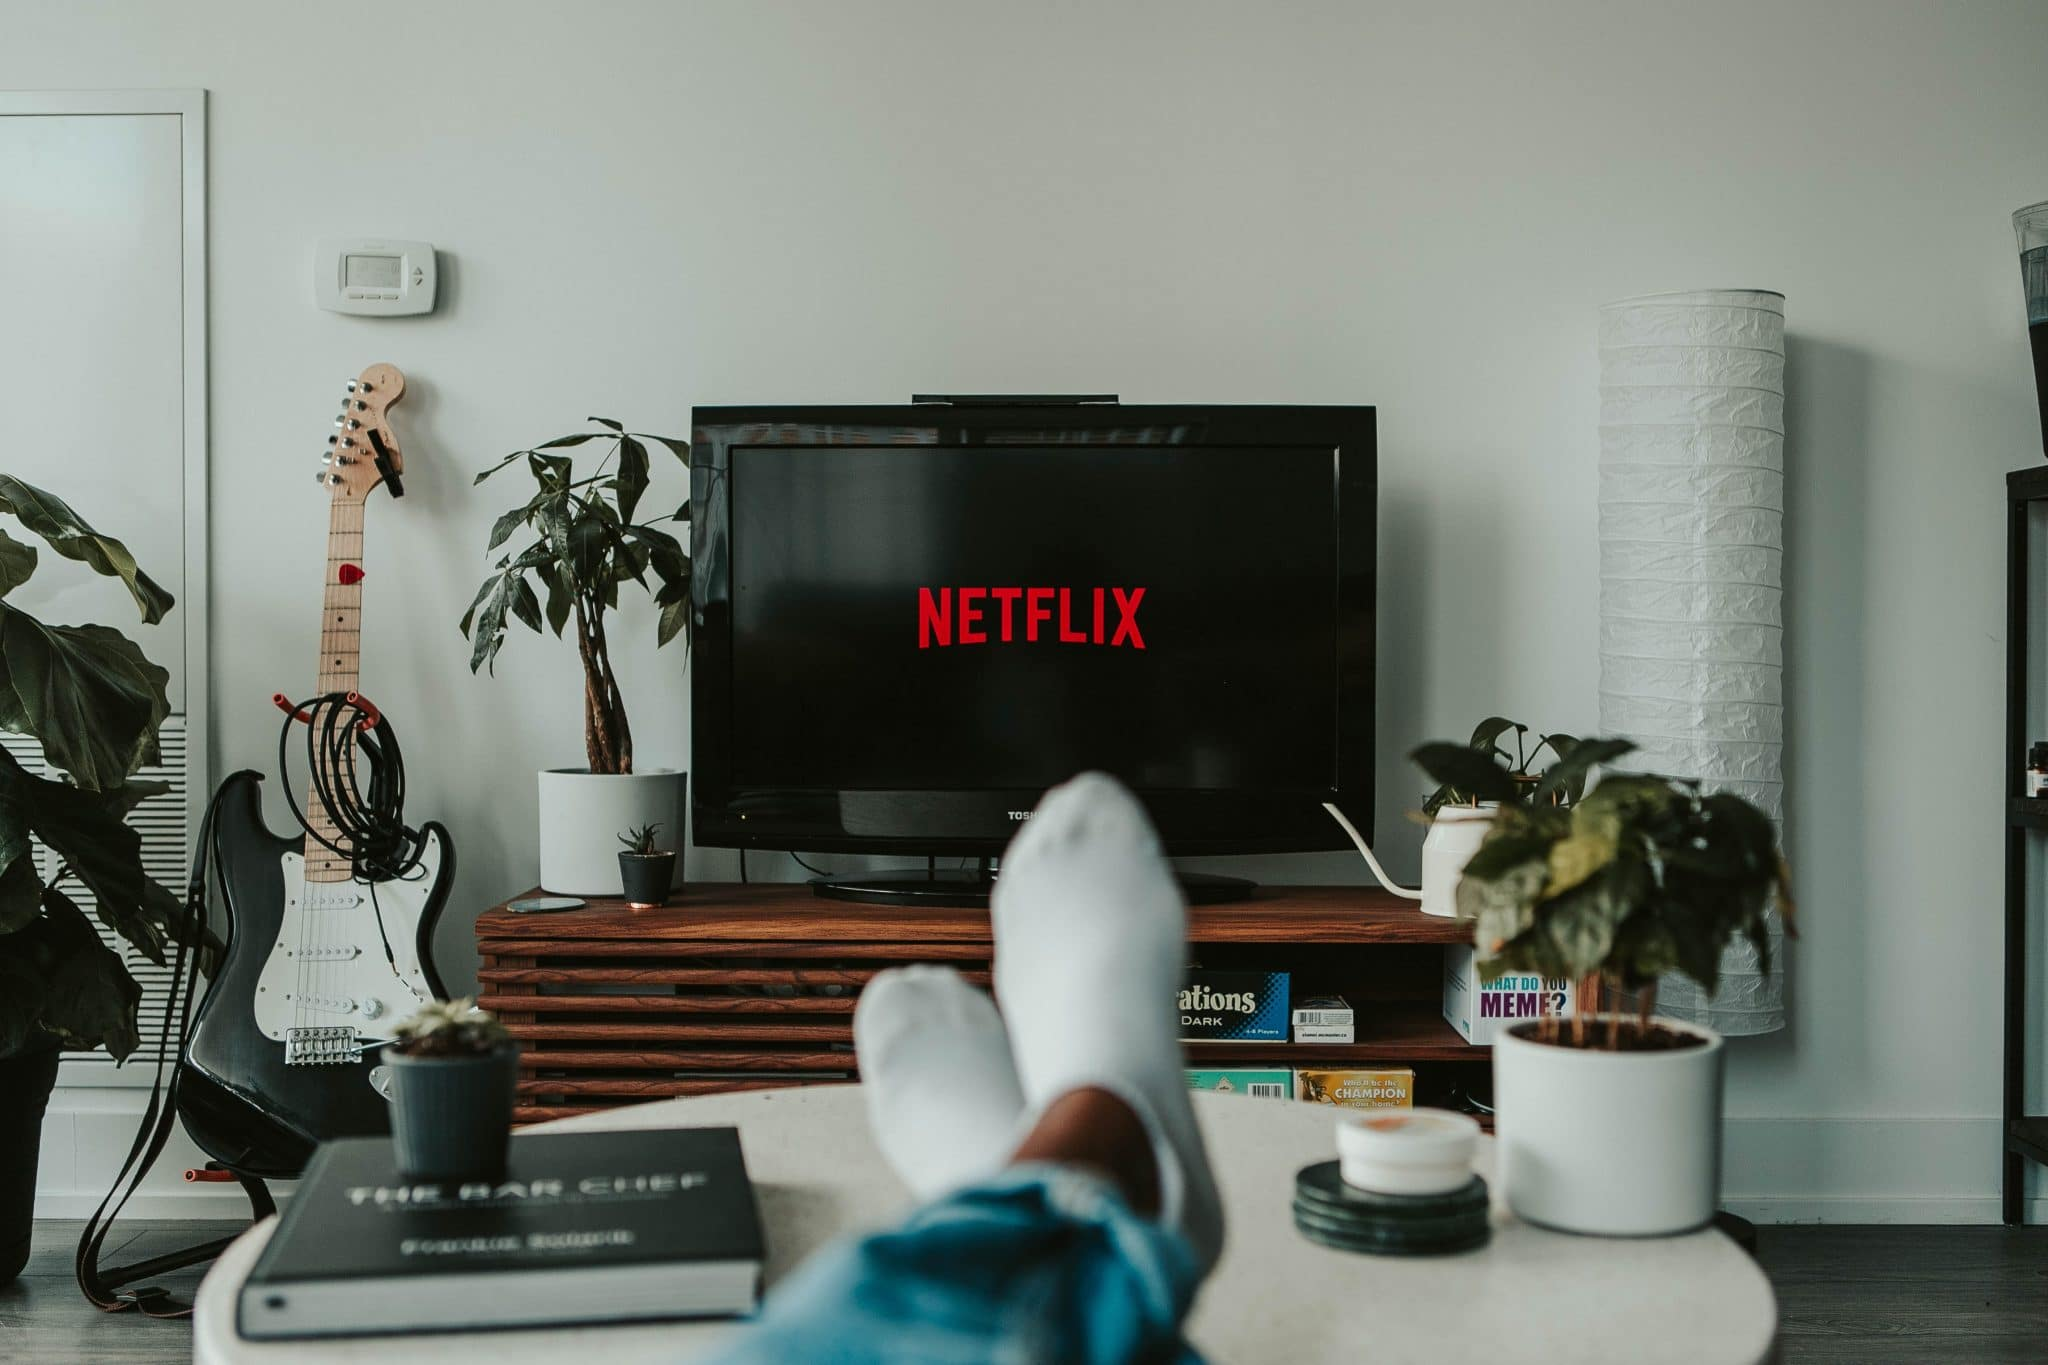 Watching Netflix on TV